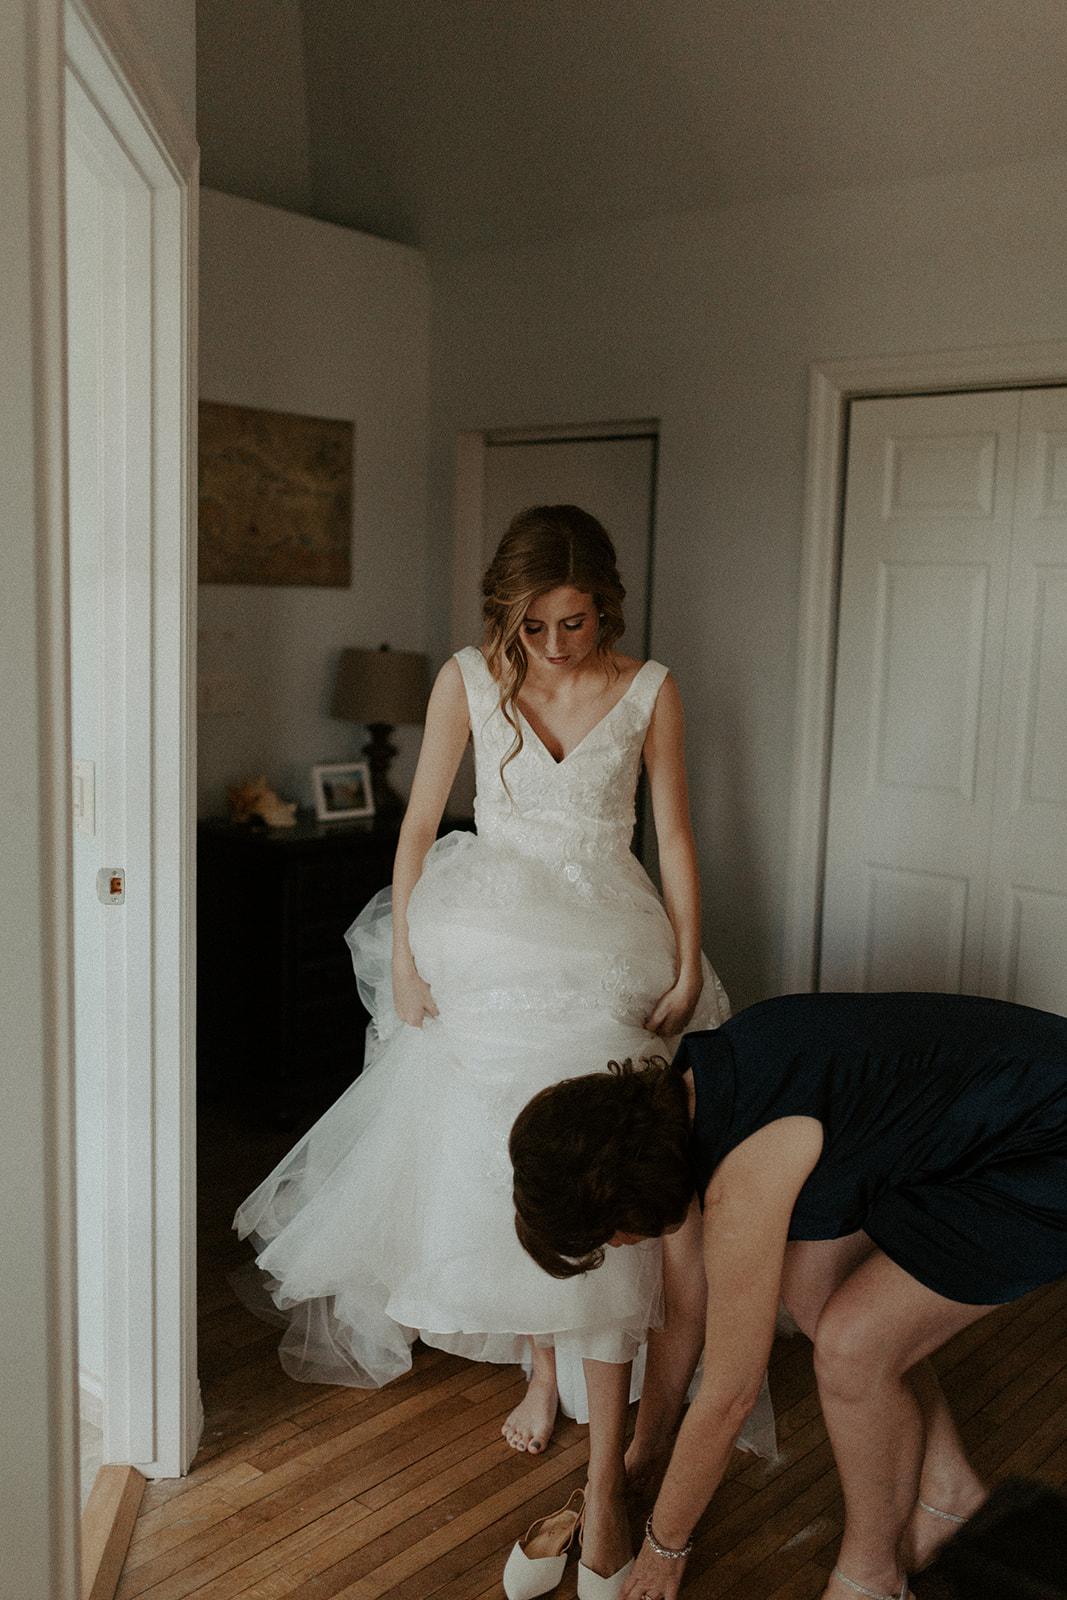 camp_wokanda_peoria_illinois_wedding_photographer_wright_photographs_bliese_0086_websize.jpg